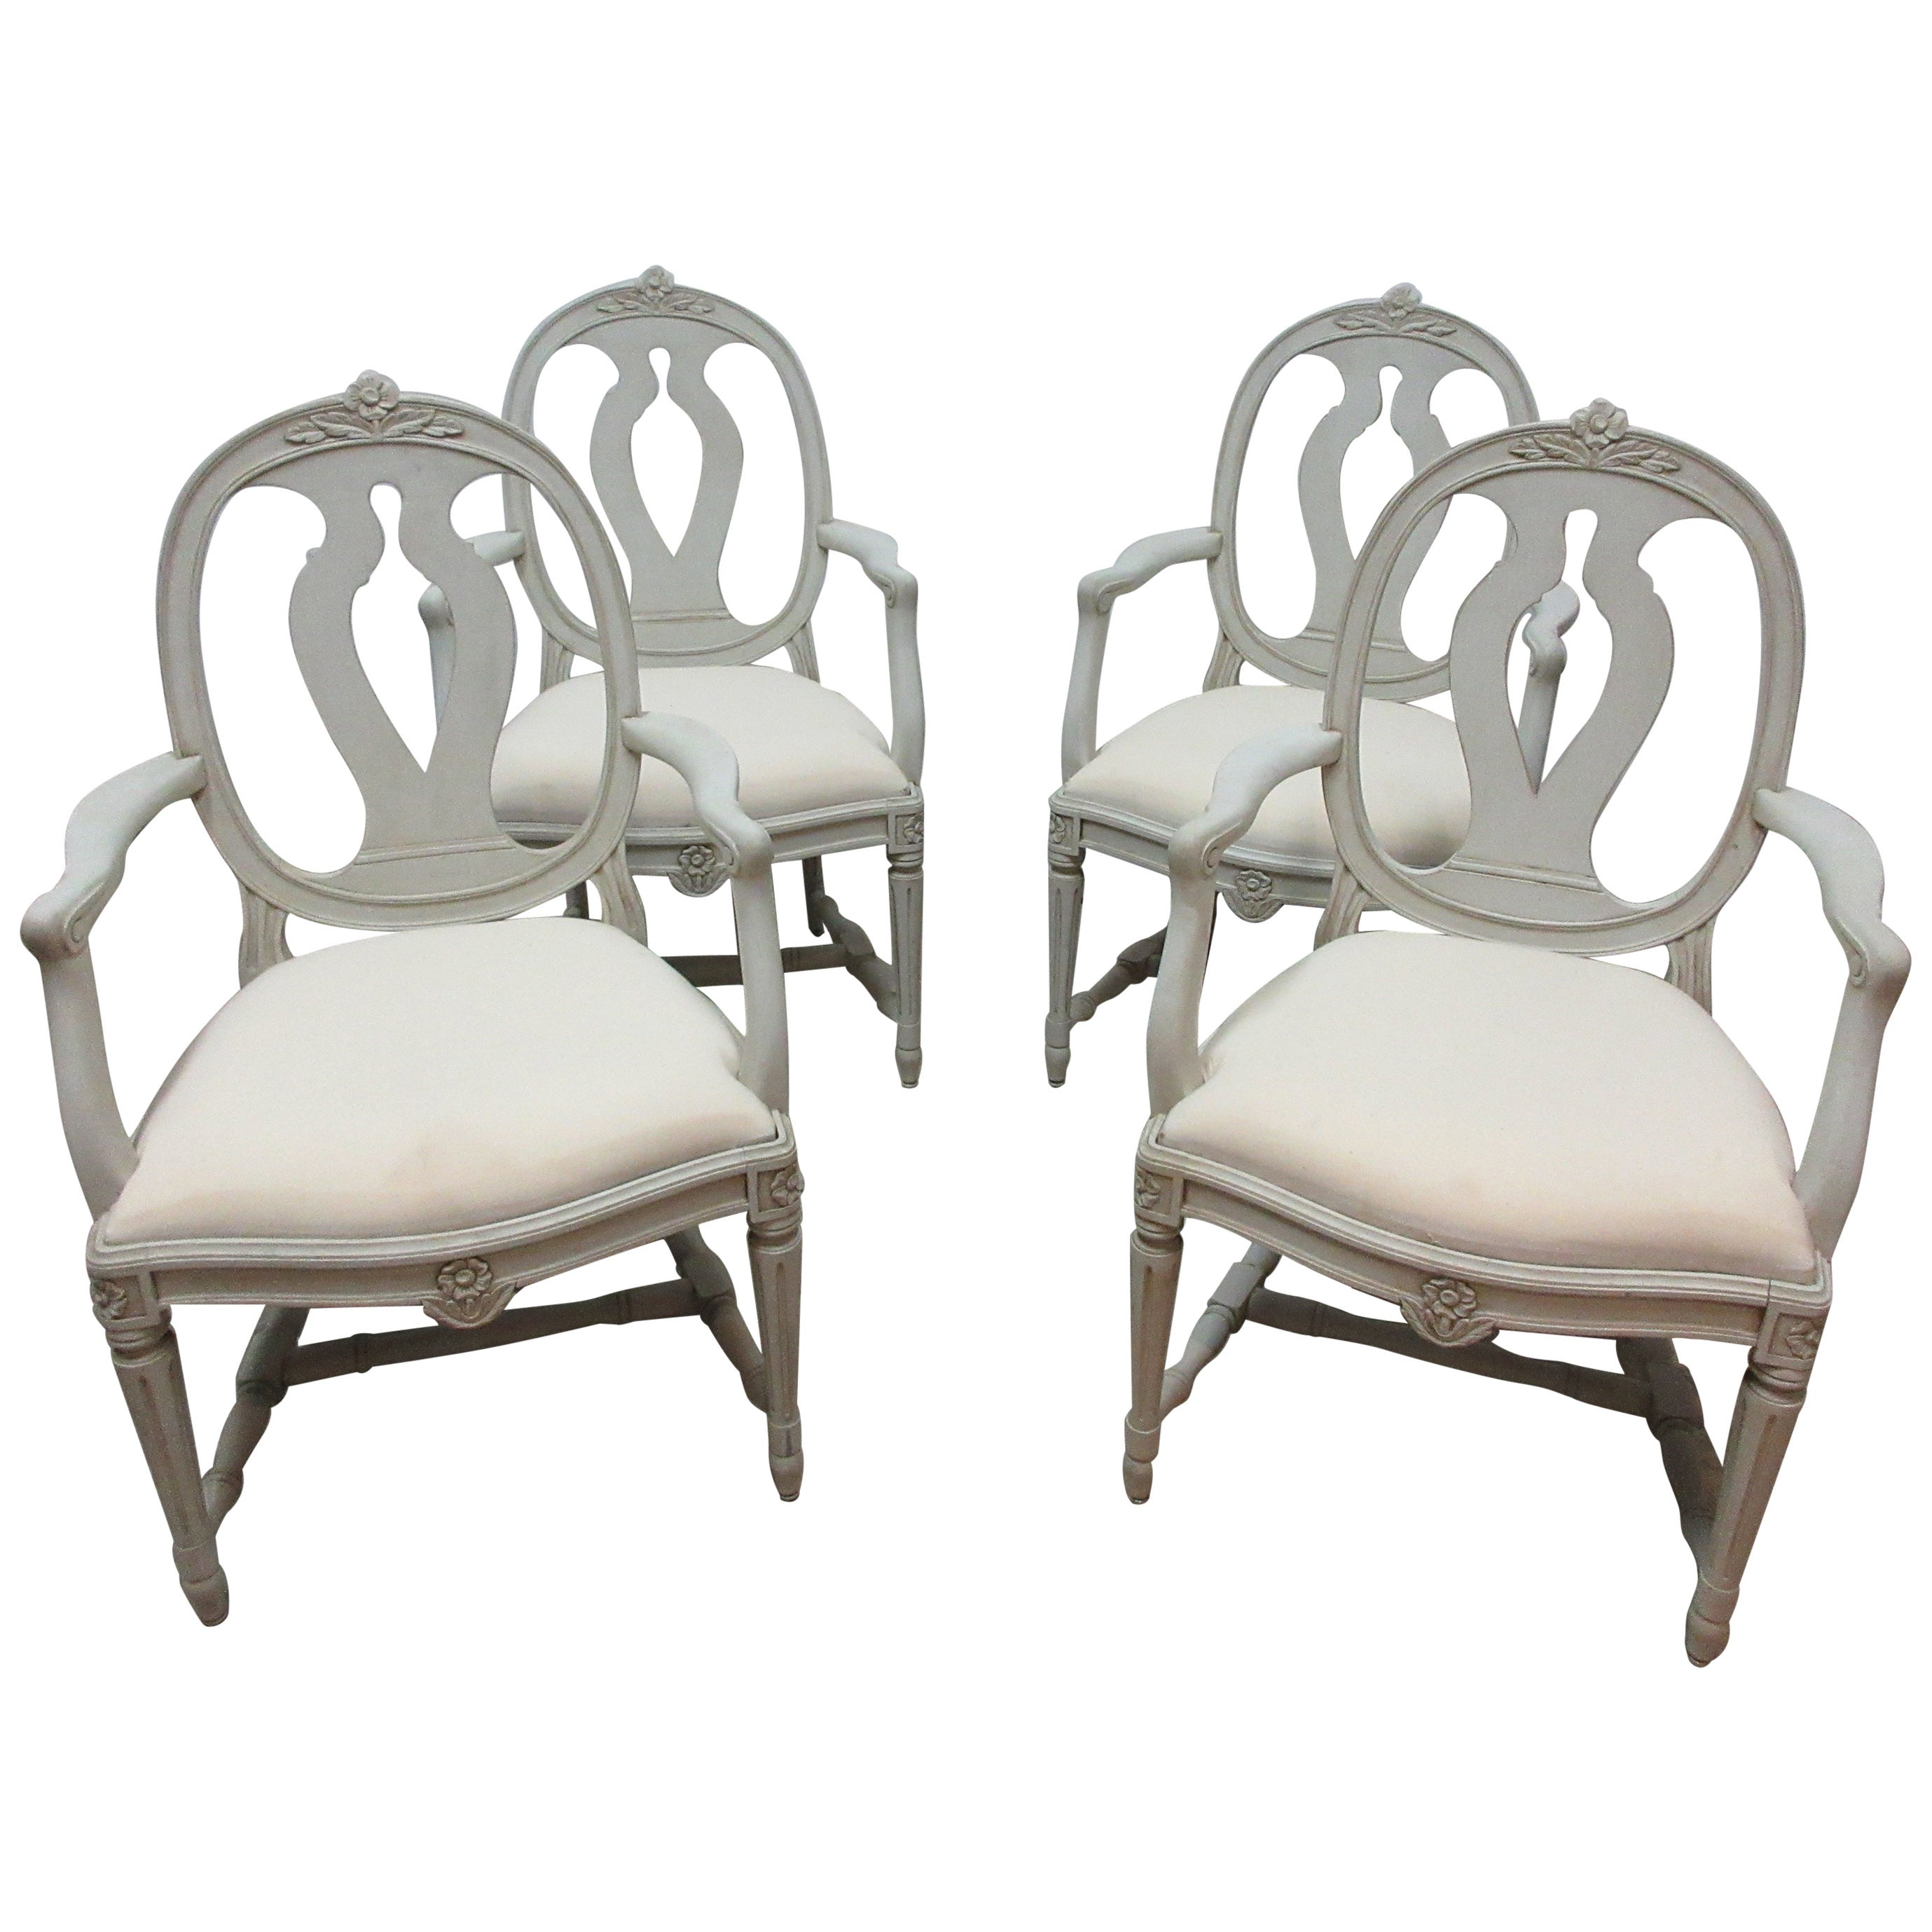 Set of 4 Swedish Gustavian Armchairs